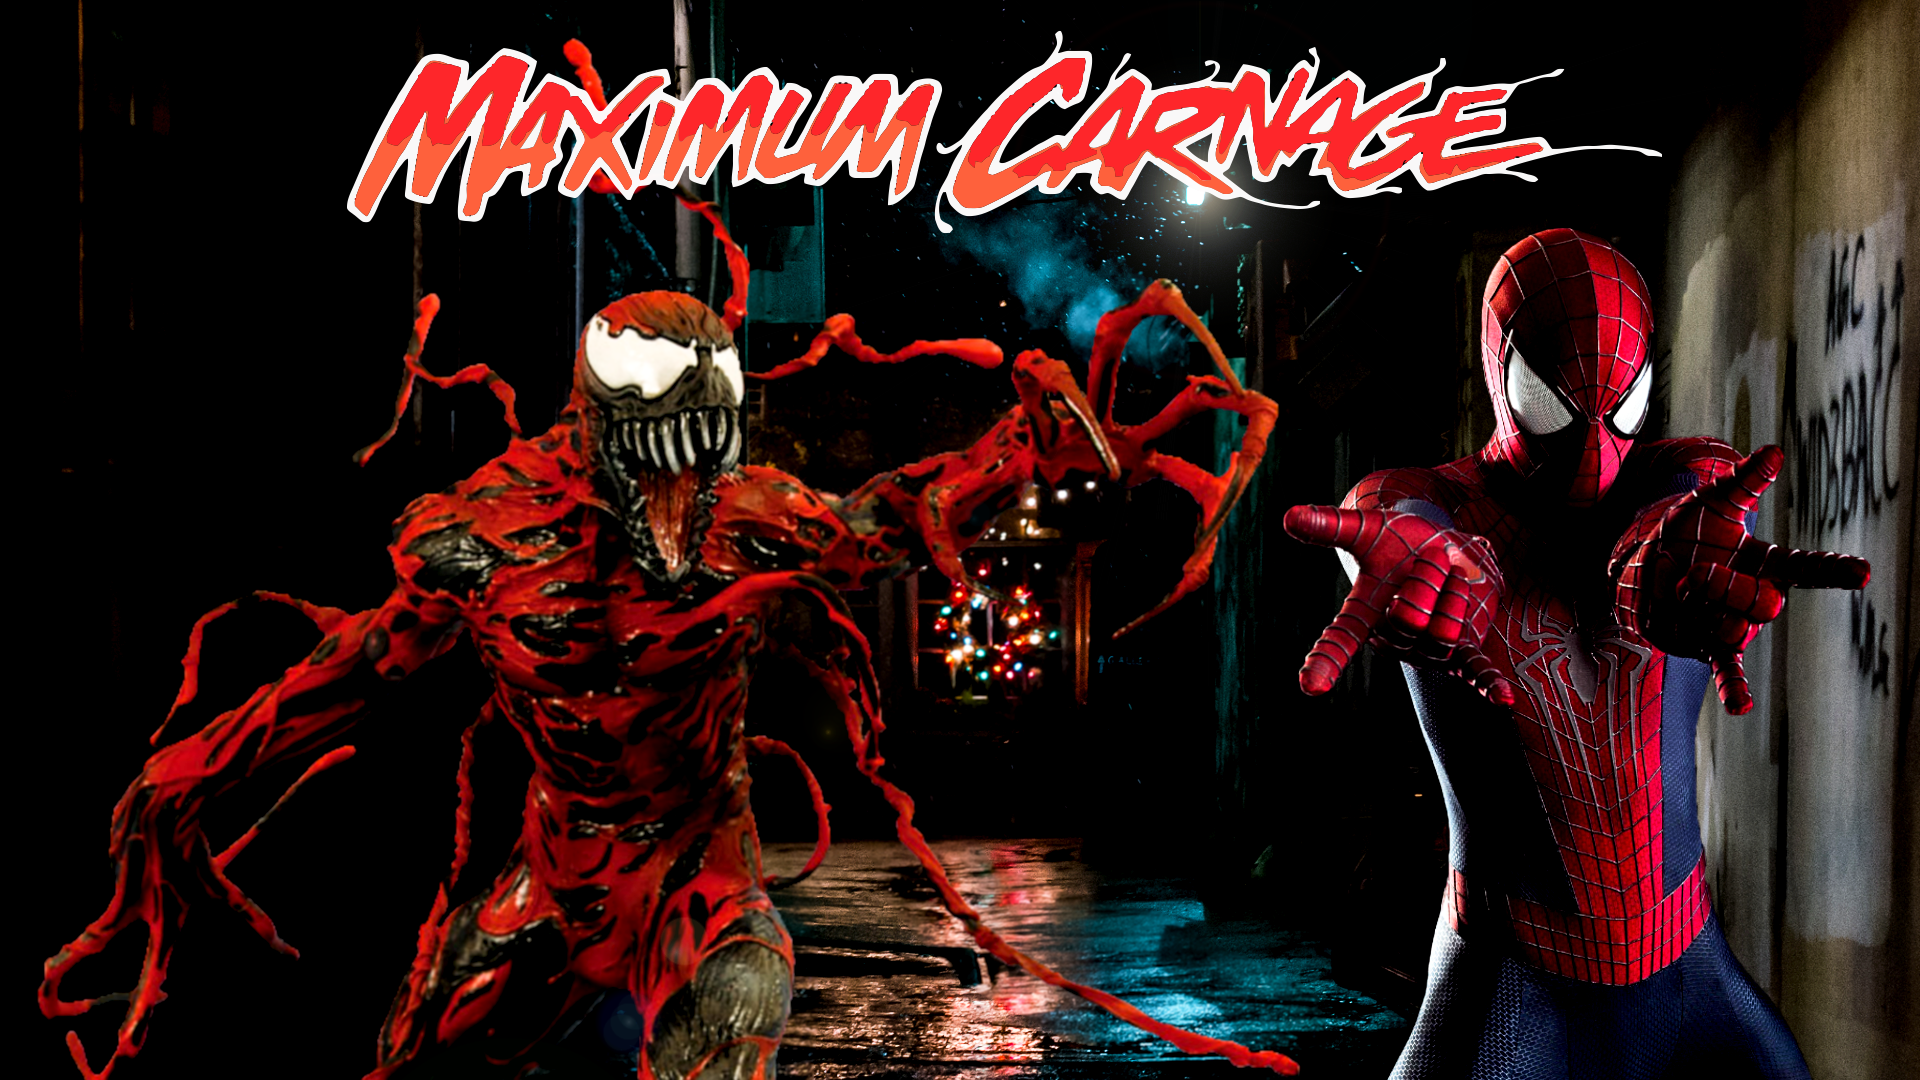 Spider Man and Venom Maximum Carnage Poster 2 by ProfessorAdagio on 1920x1080